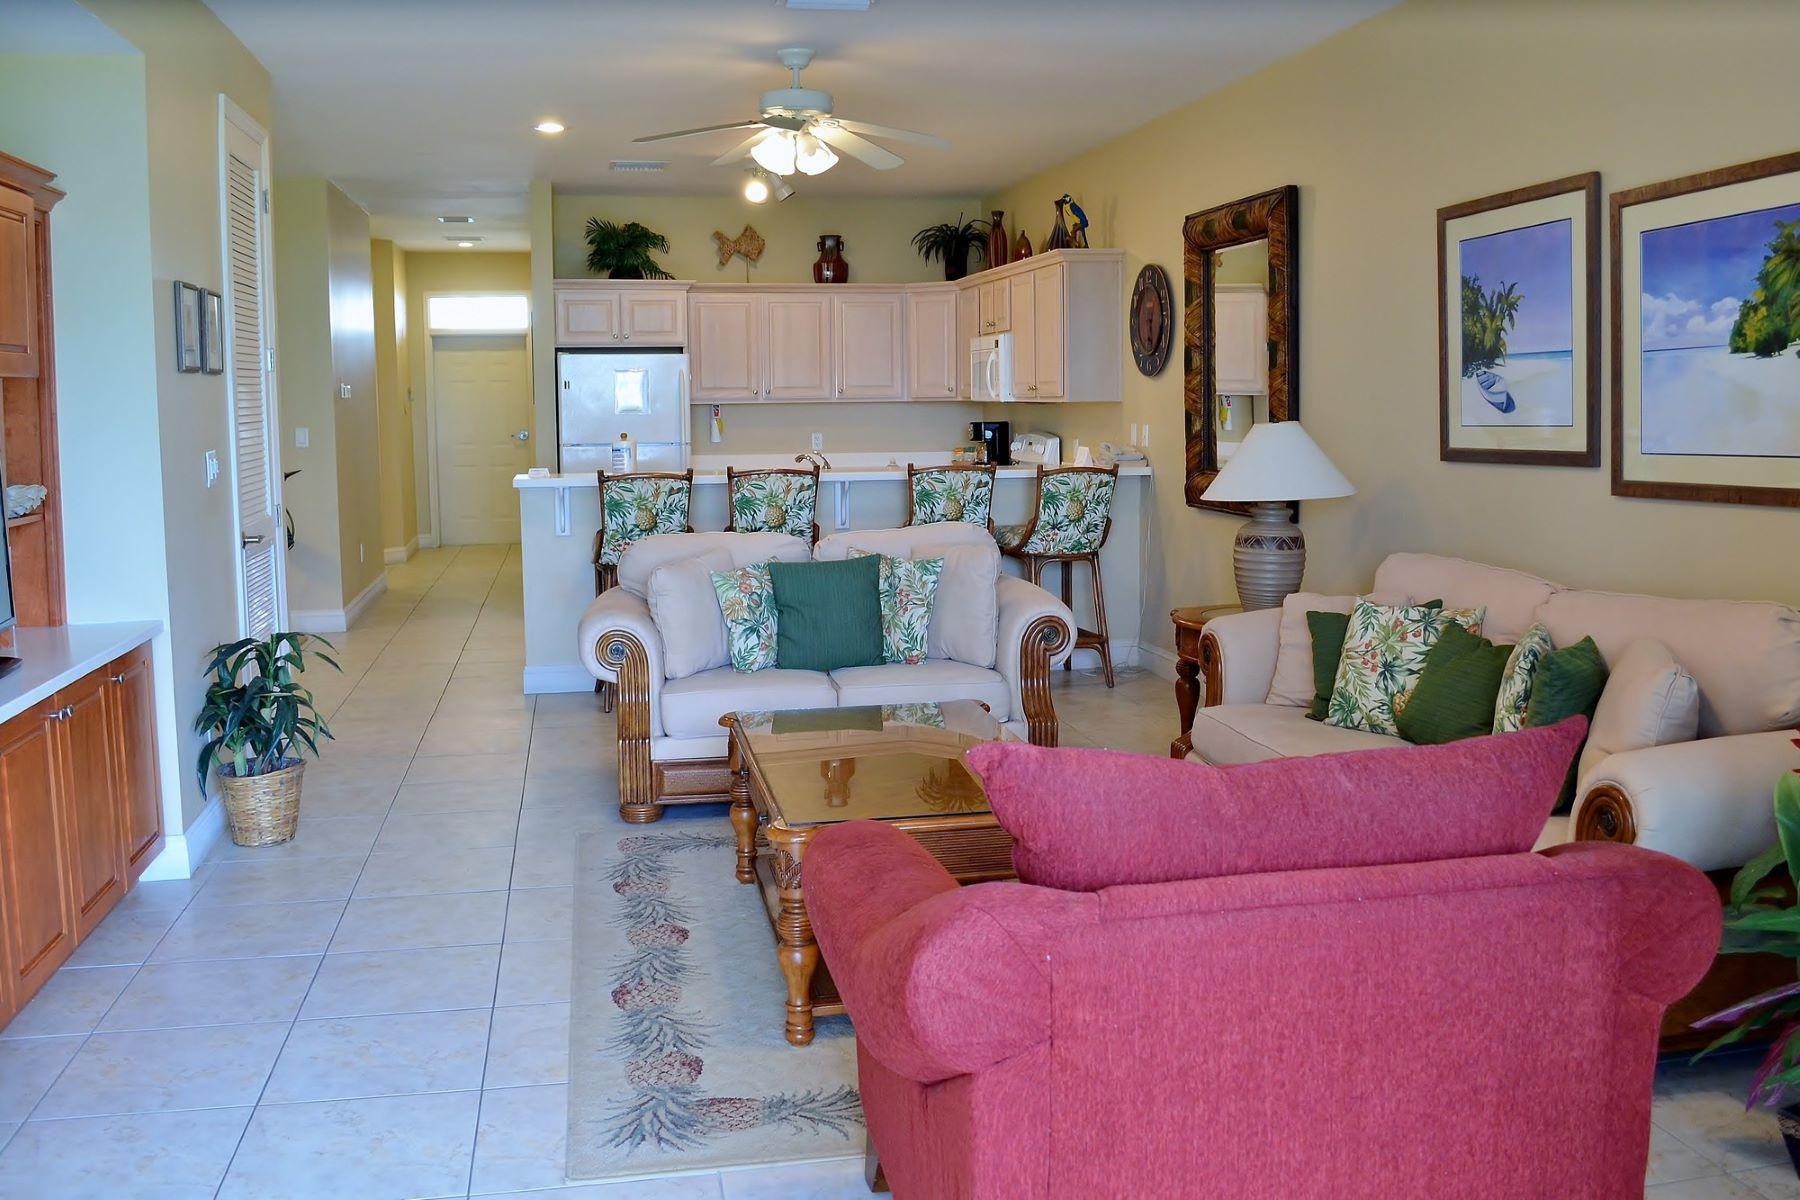 Additional photo for property listing at Bahama Beach Club 2055 Bahama Beach Club, Treasure Cay, Abaco Bahamas